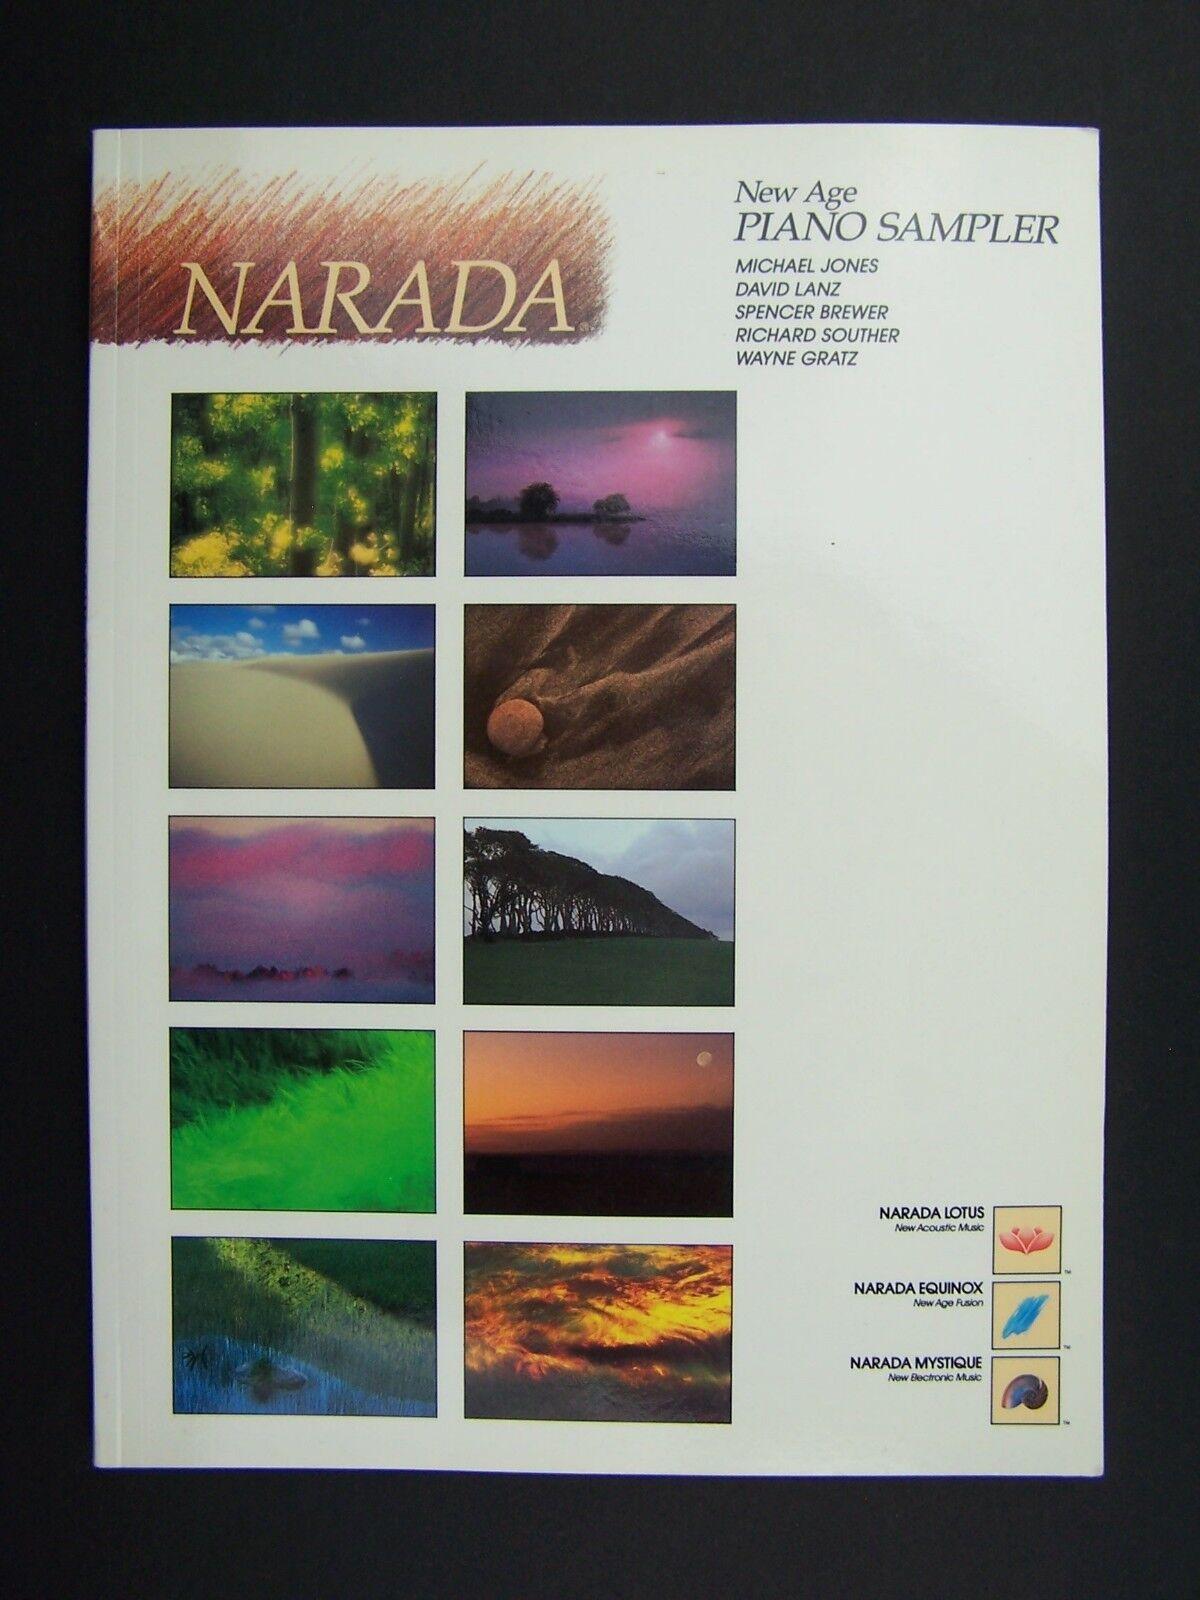 Narada New Age Piano Sampler Paperback